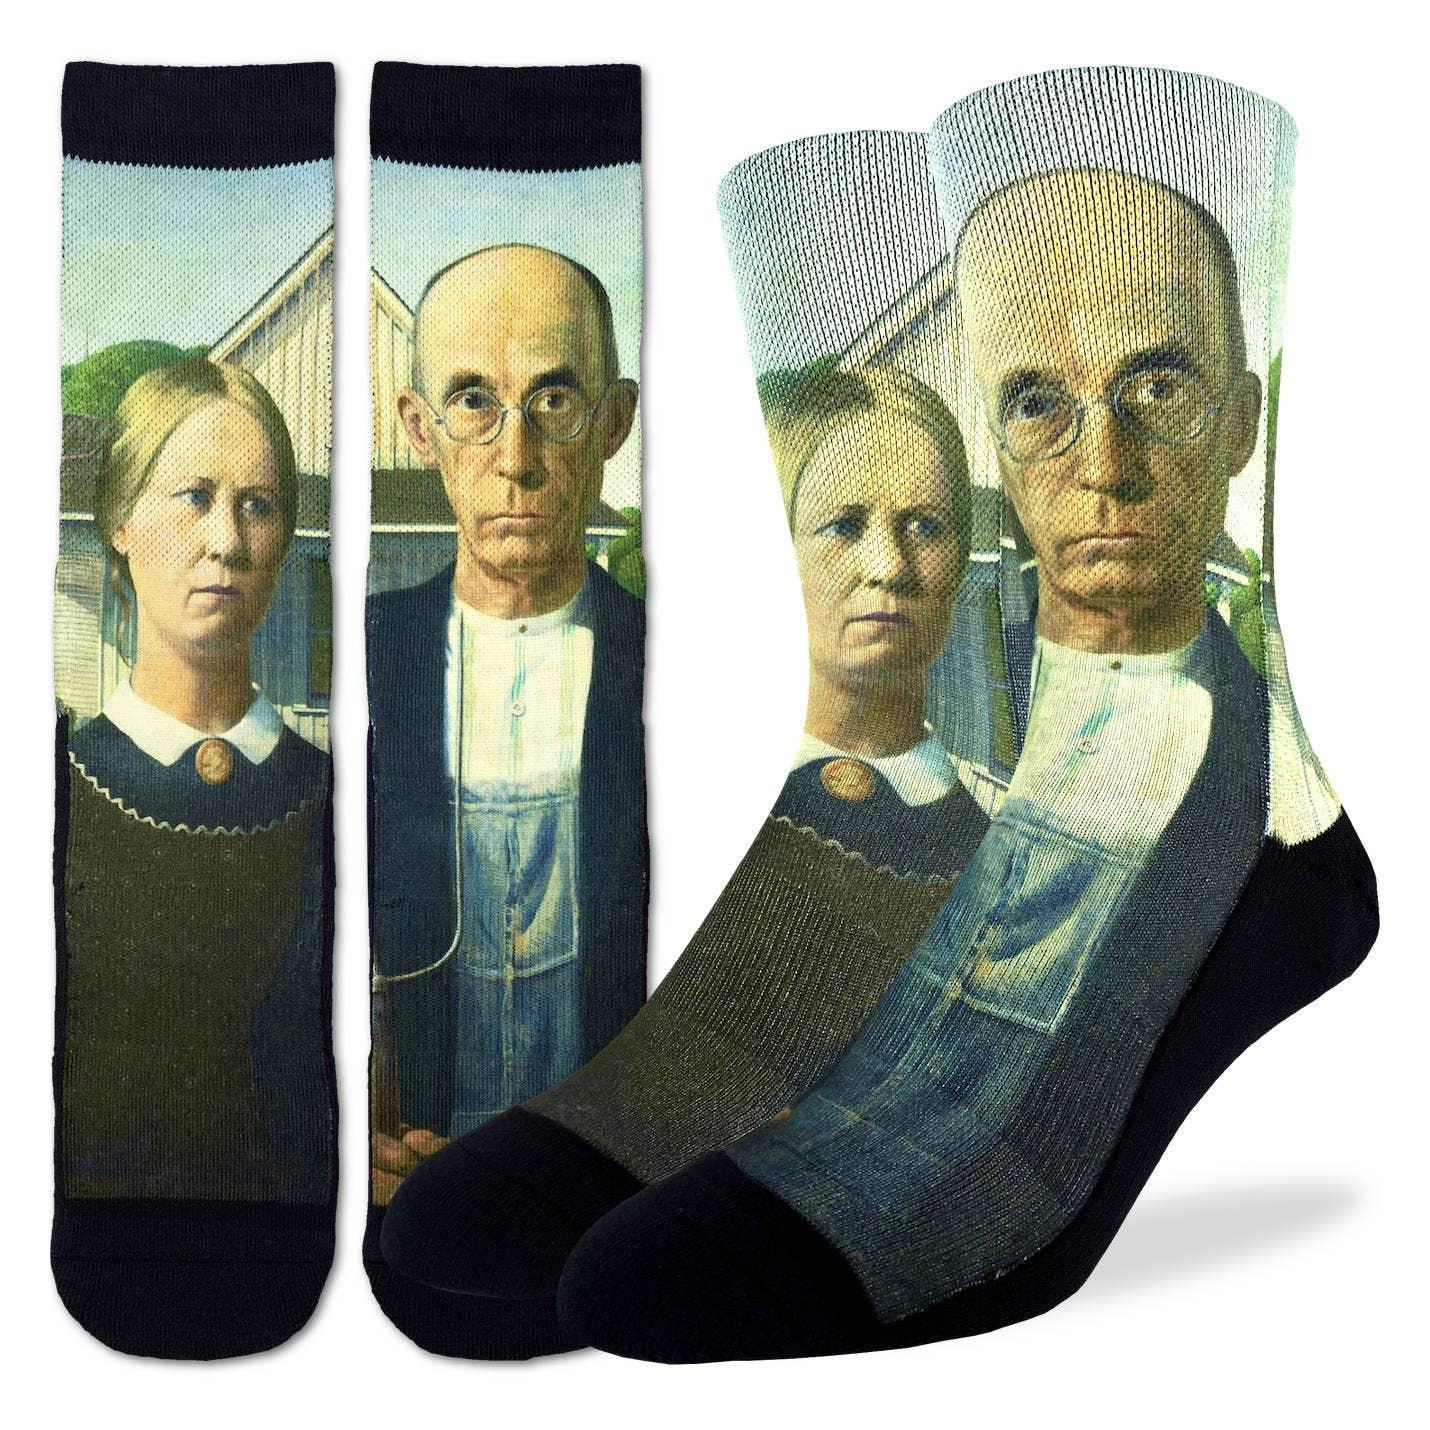 American Gothic Men's Crew Socks